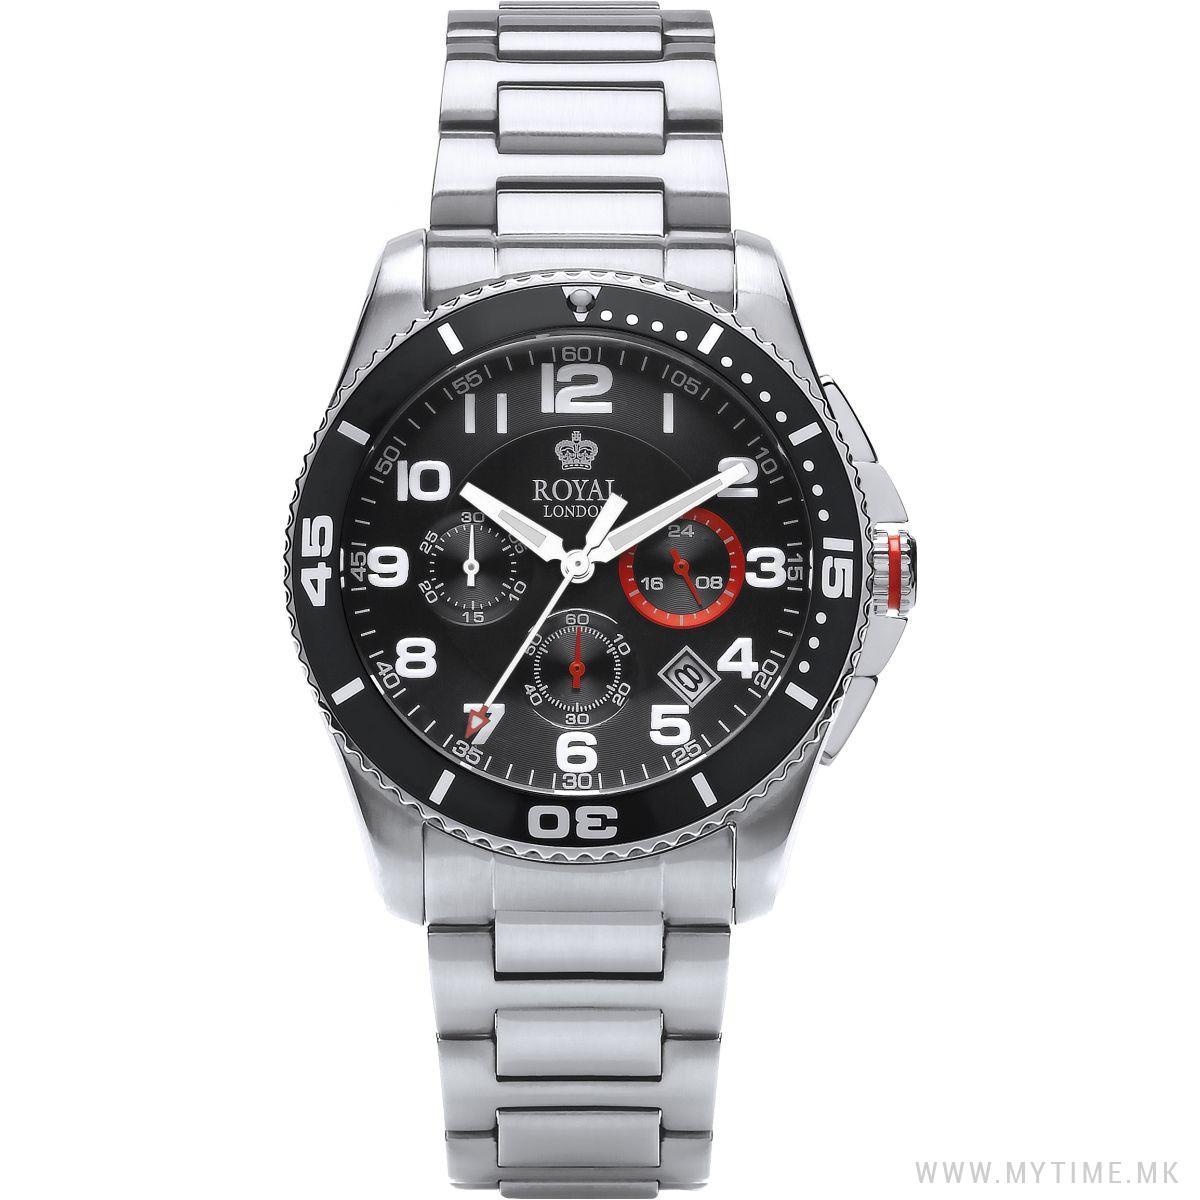 41339-01 Sport Chronograph